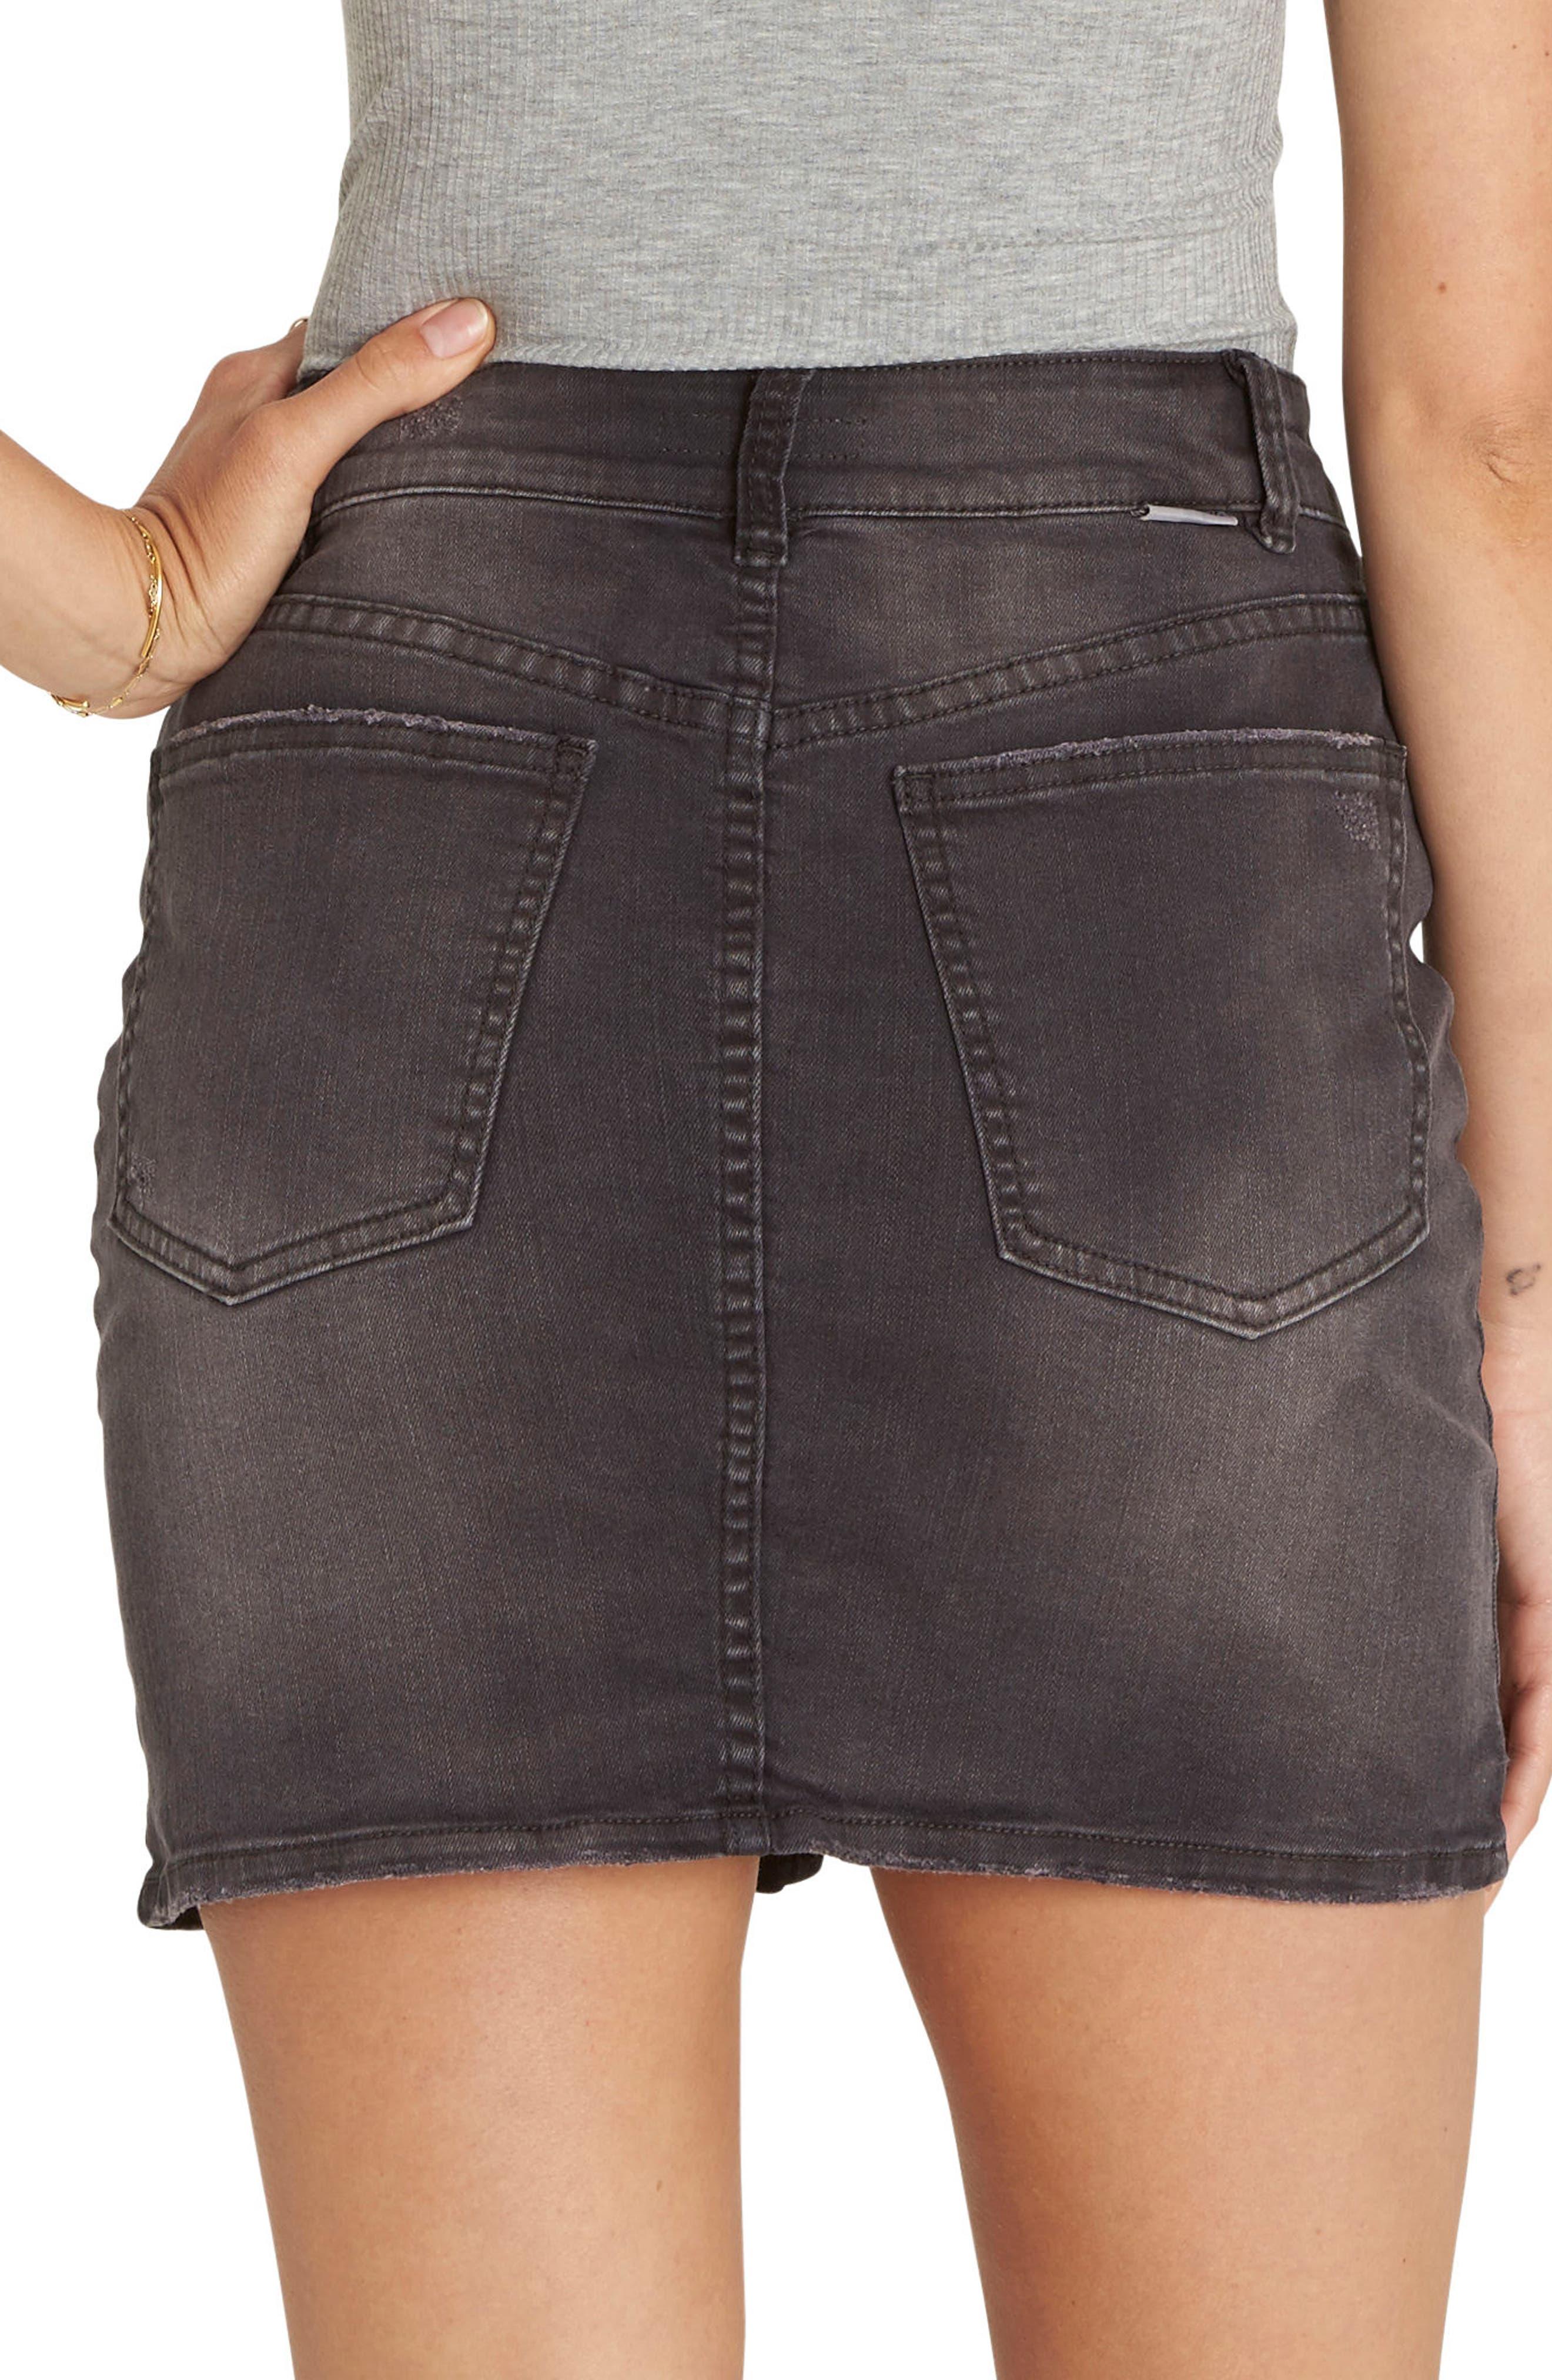 Black Magic Denim Skirt,                             Alternate thumbnail 2, color,                             001